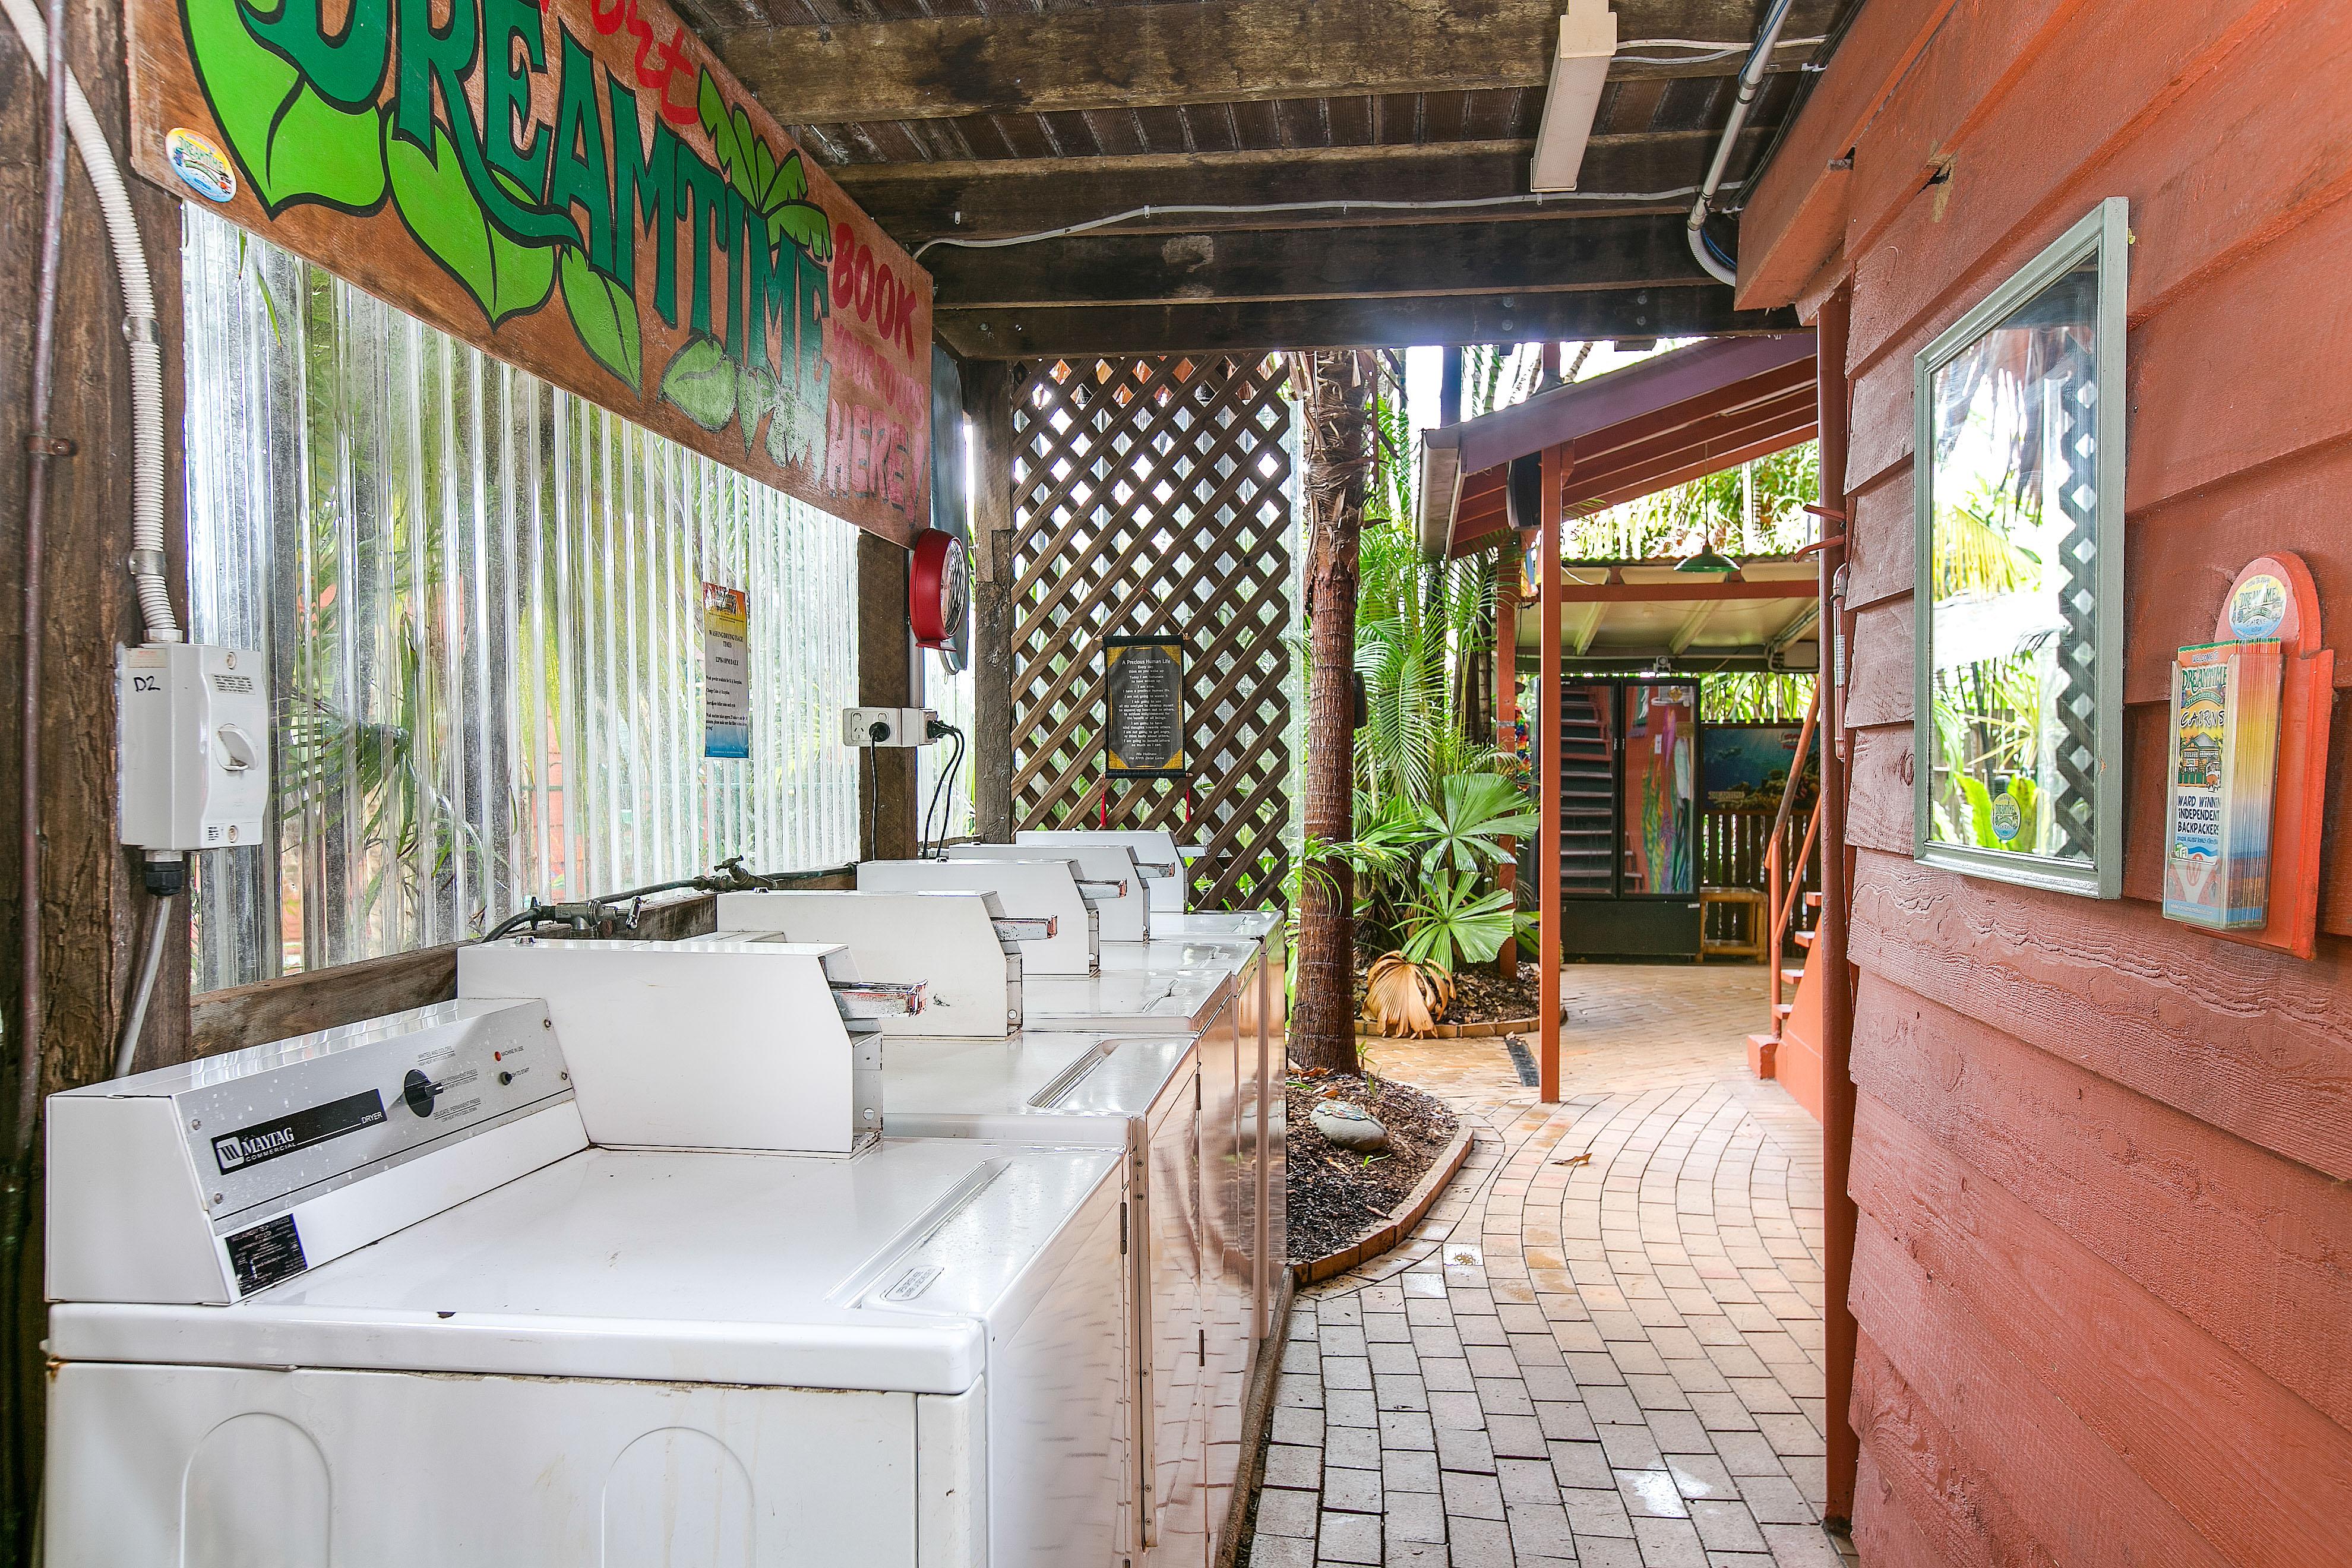 laundry-hostel-facilities-cairns-australia